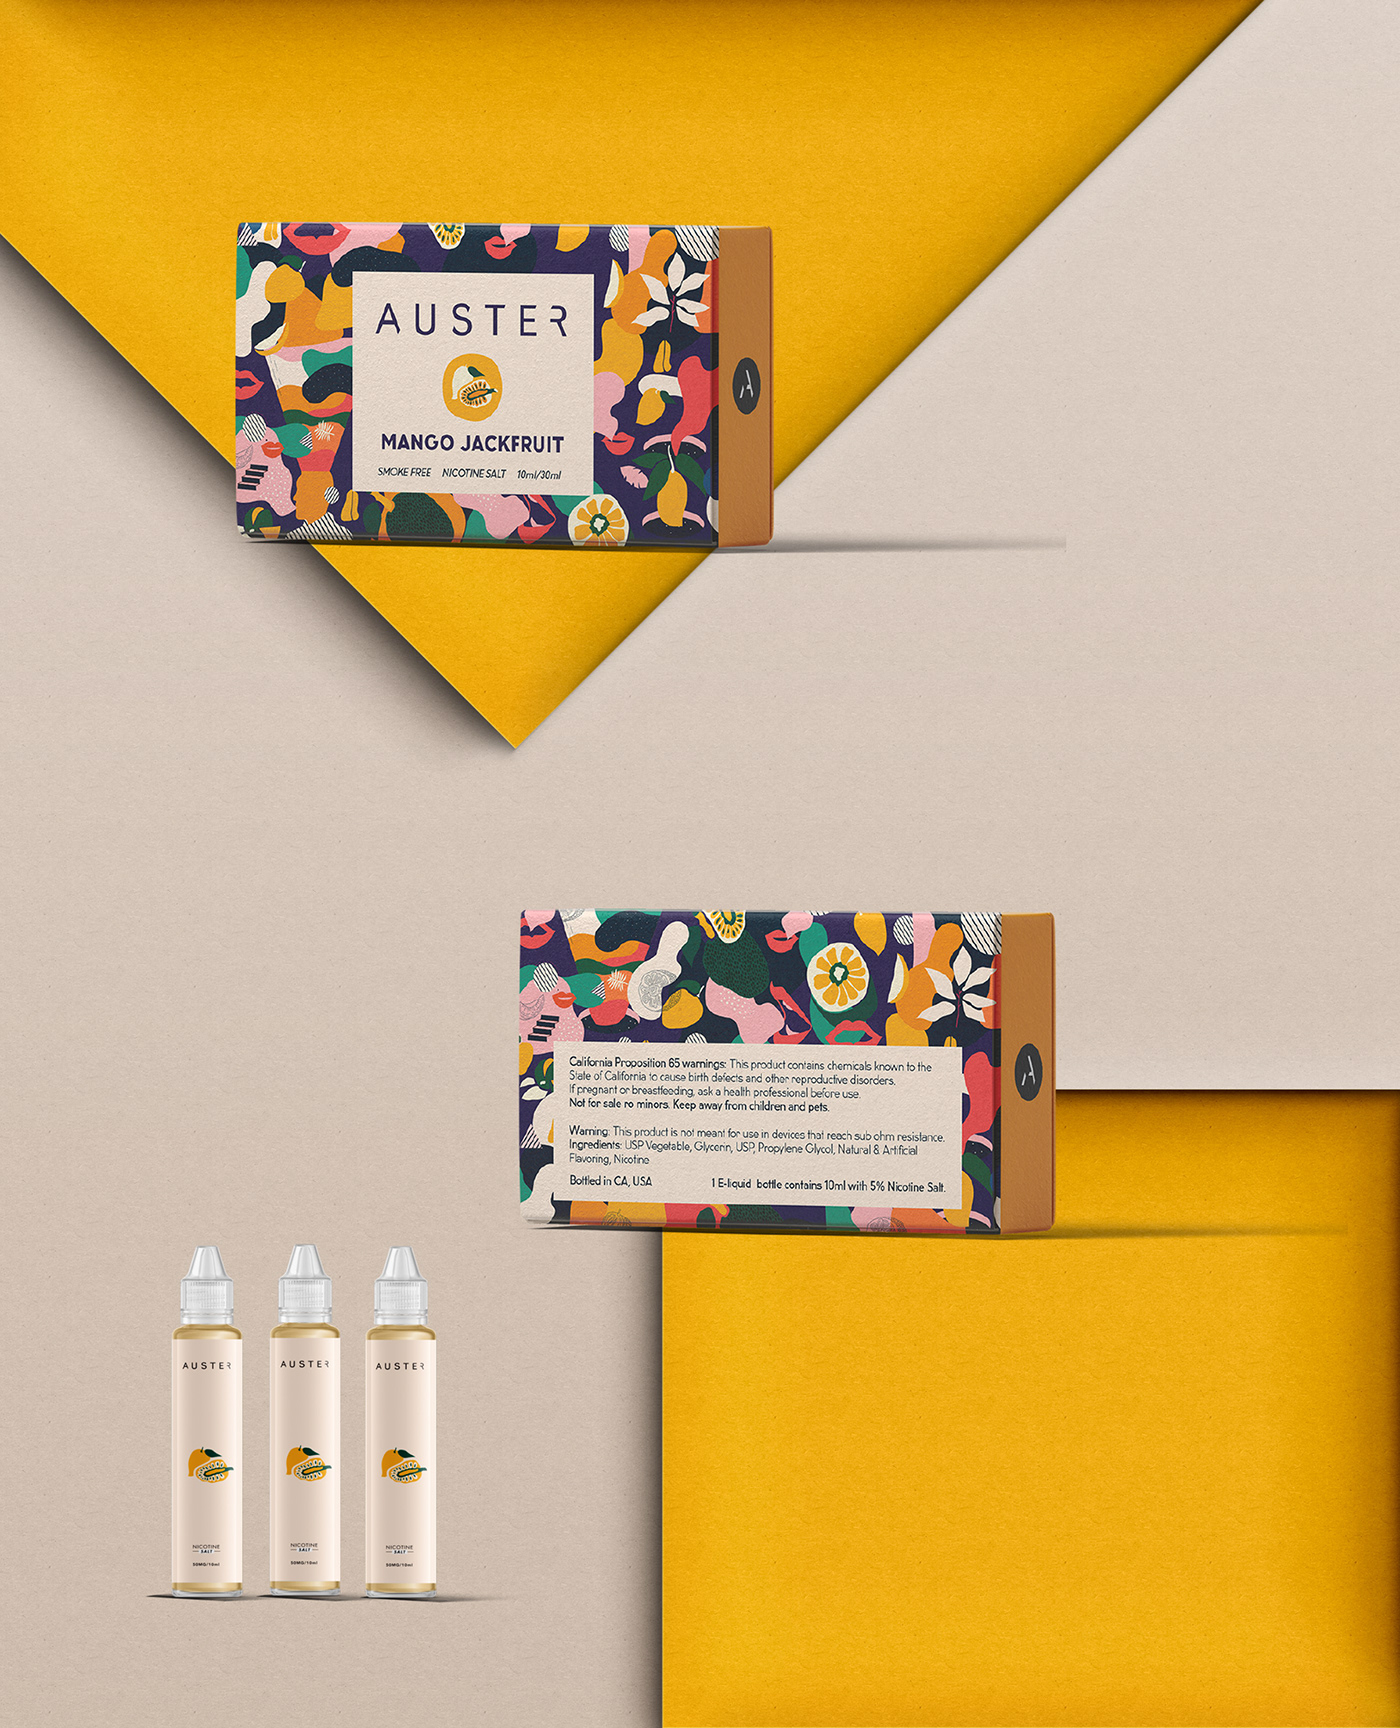 Vape e-liquids flavor culture e-ciggarette Fruit auster salts